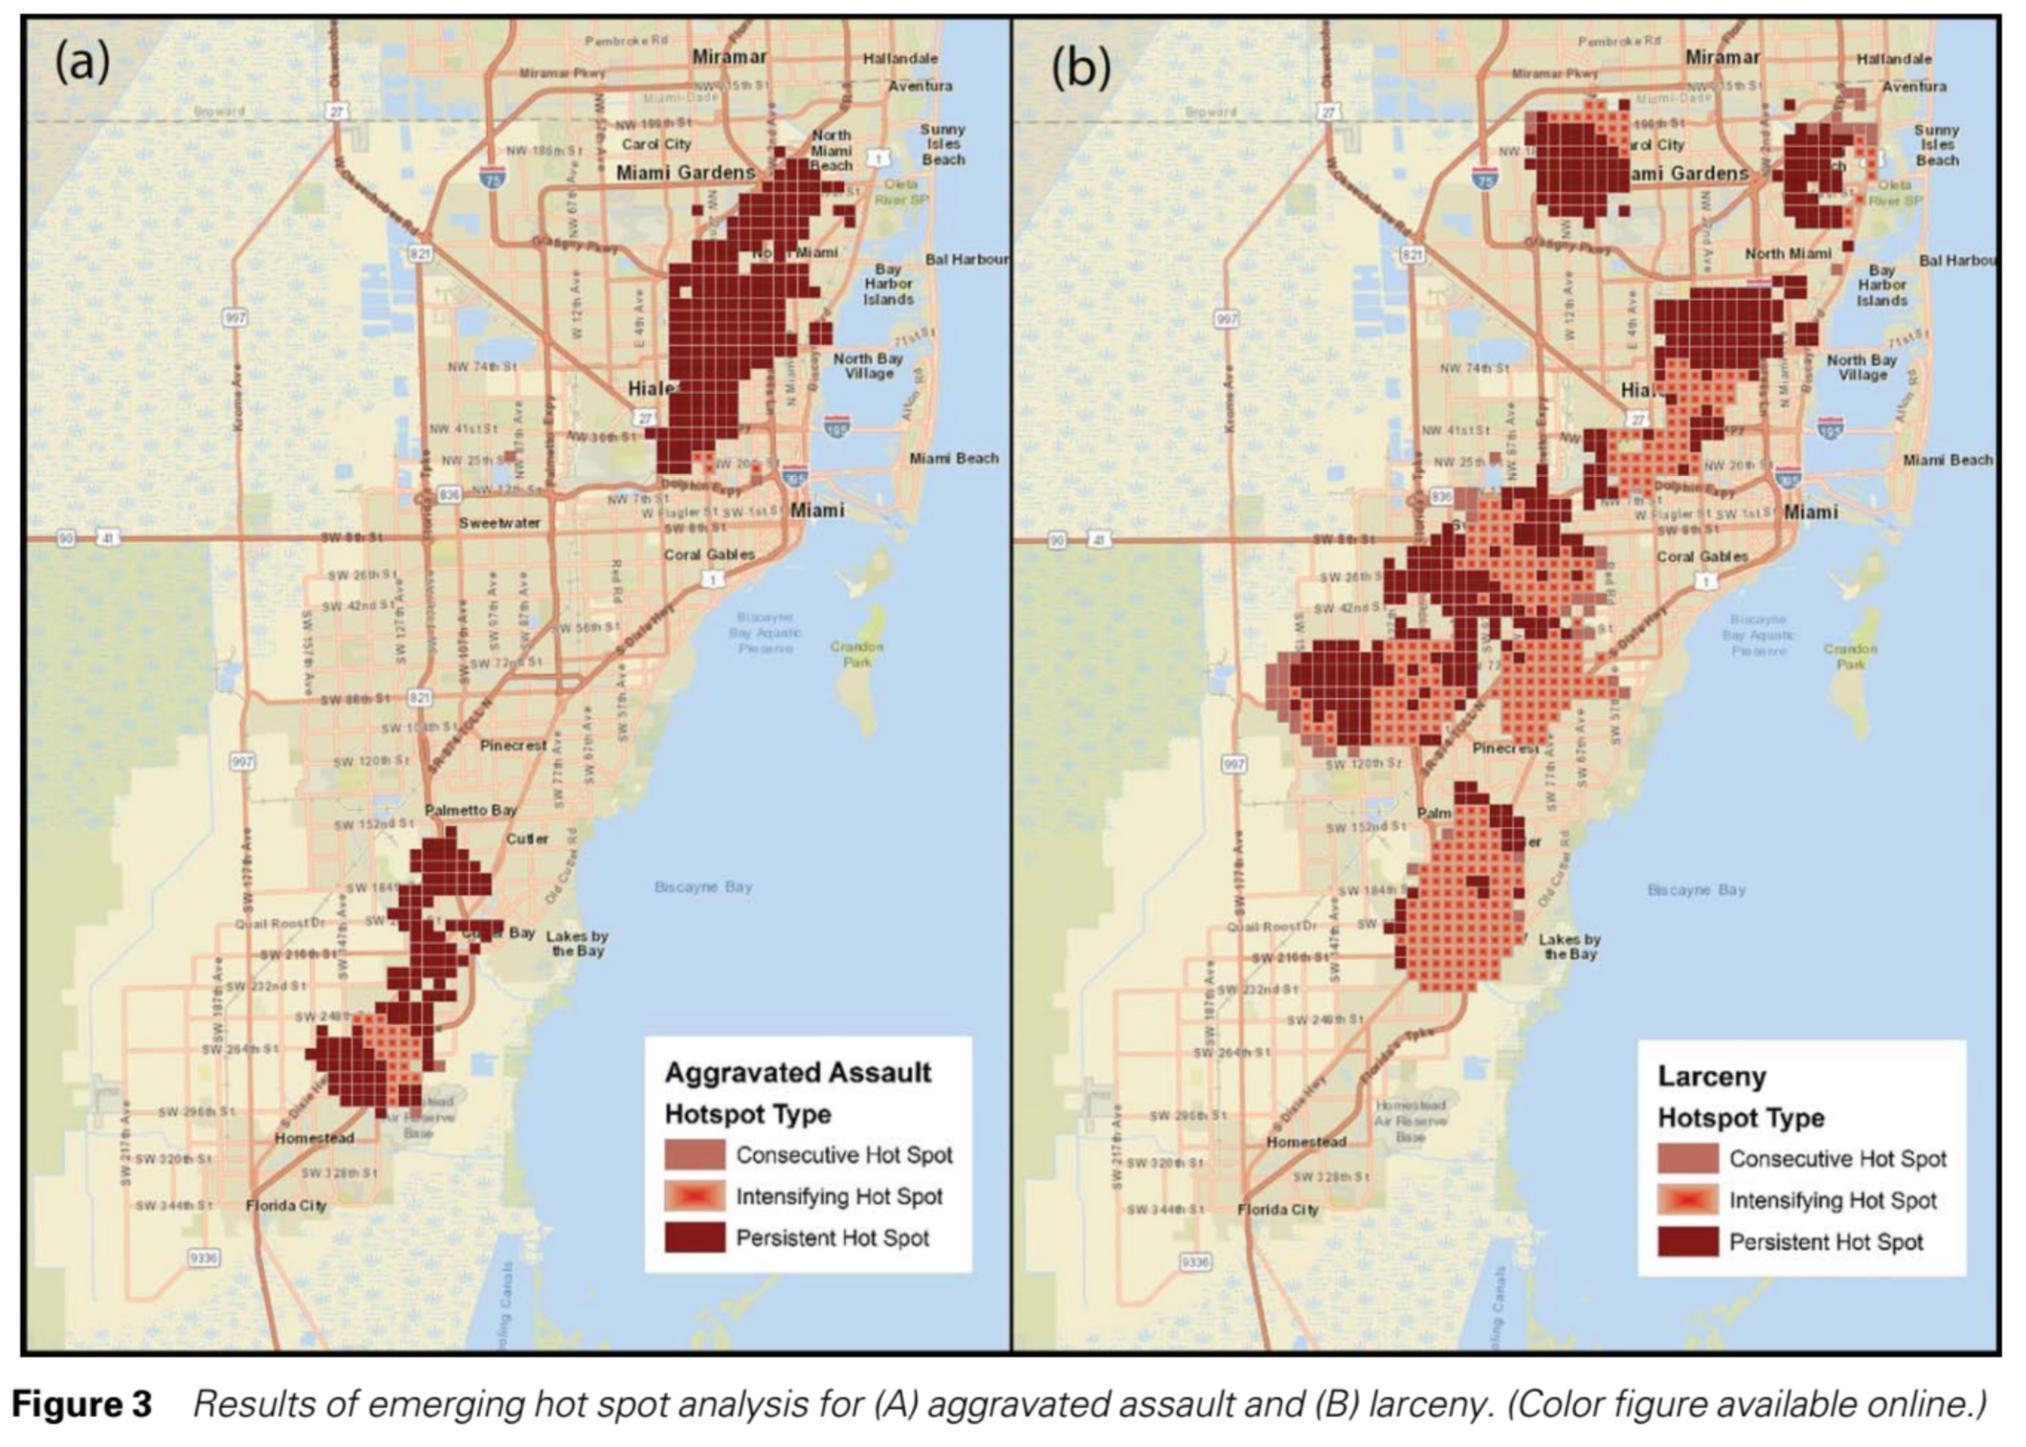 Brottslighet Karta Miami Miami Brottslighet Karta Florida Usa